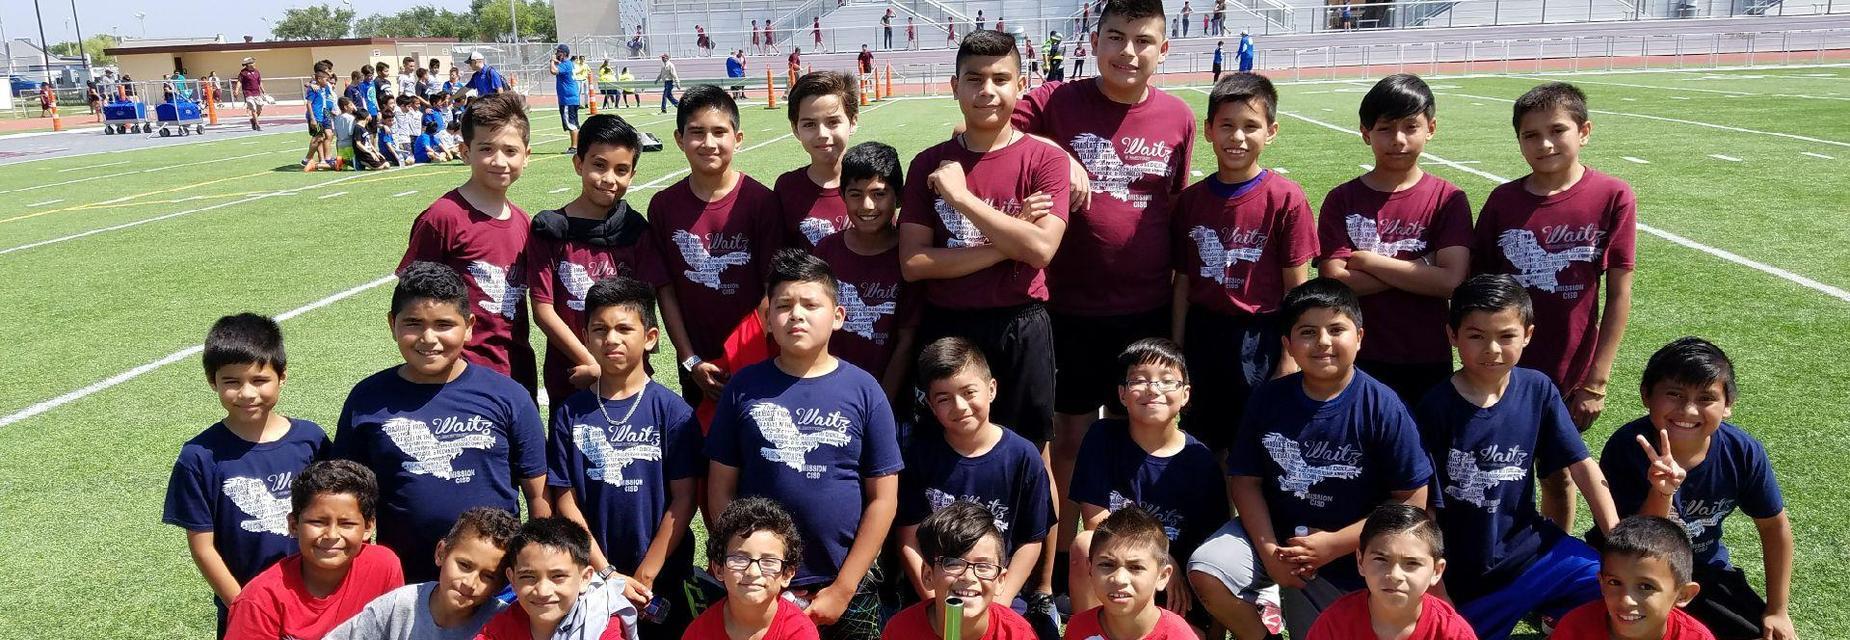 Boys track team at meet